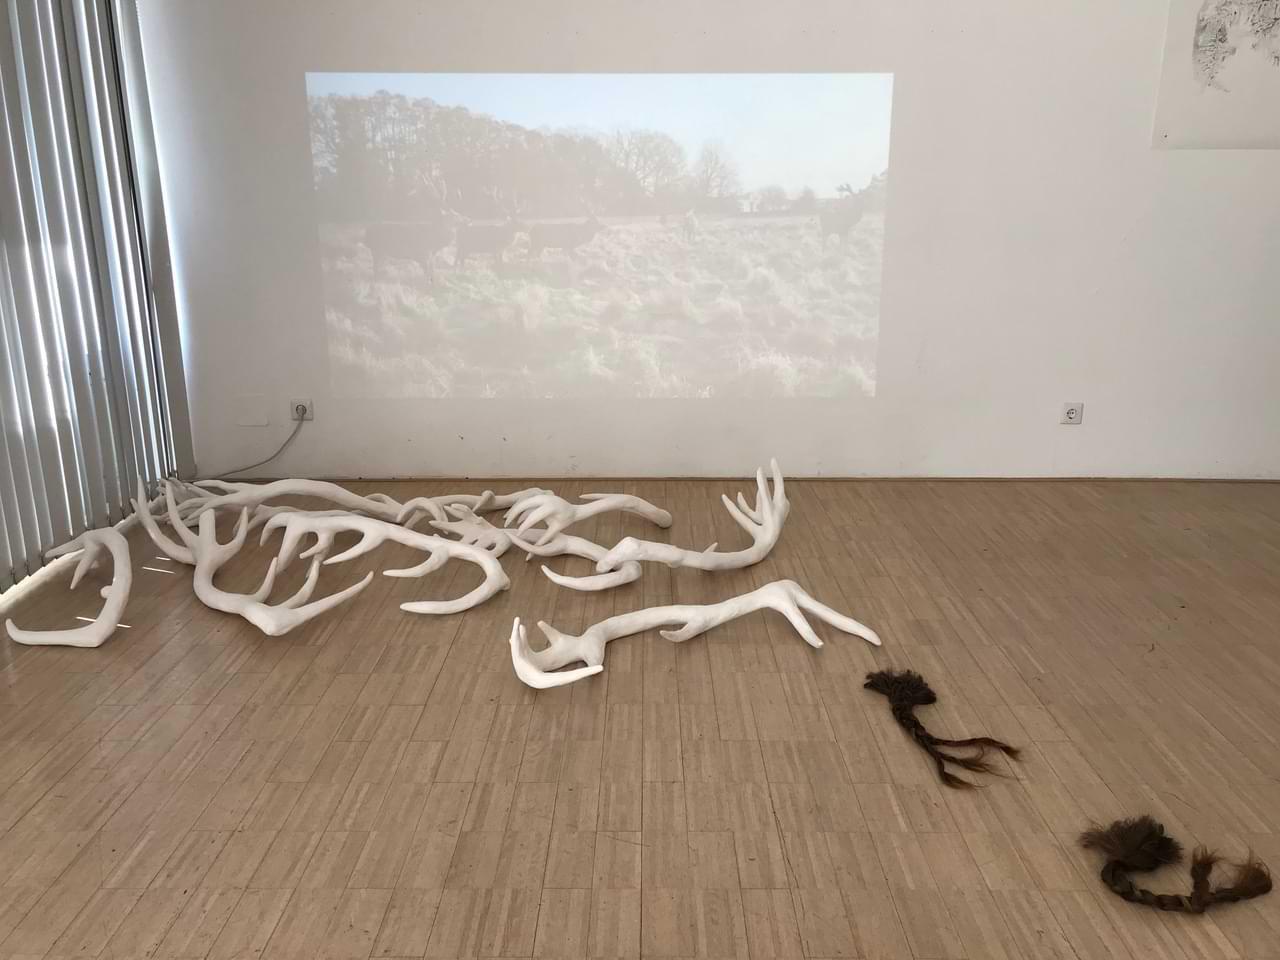 Contemplations-Gedok-Stuttgart-2-2018-performance-video-urban-landscape-deer-hirsche-malerei-painting-zeichnung-drawing-linoldruck-linoprint-installation-gipsskulpturen